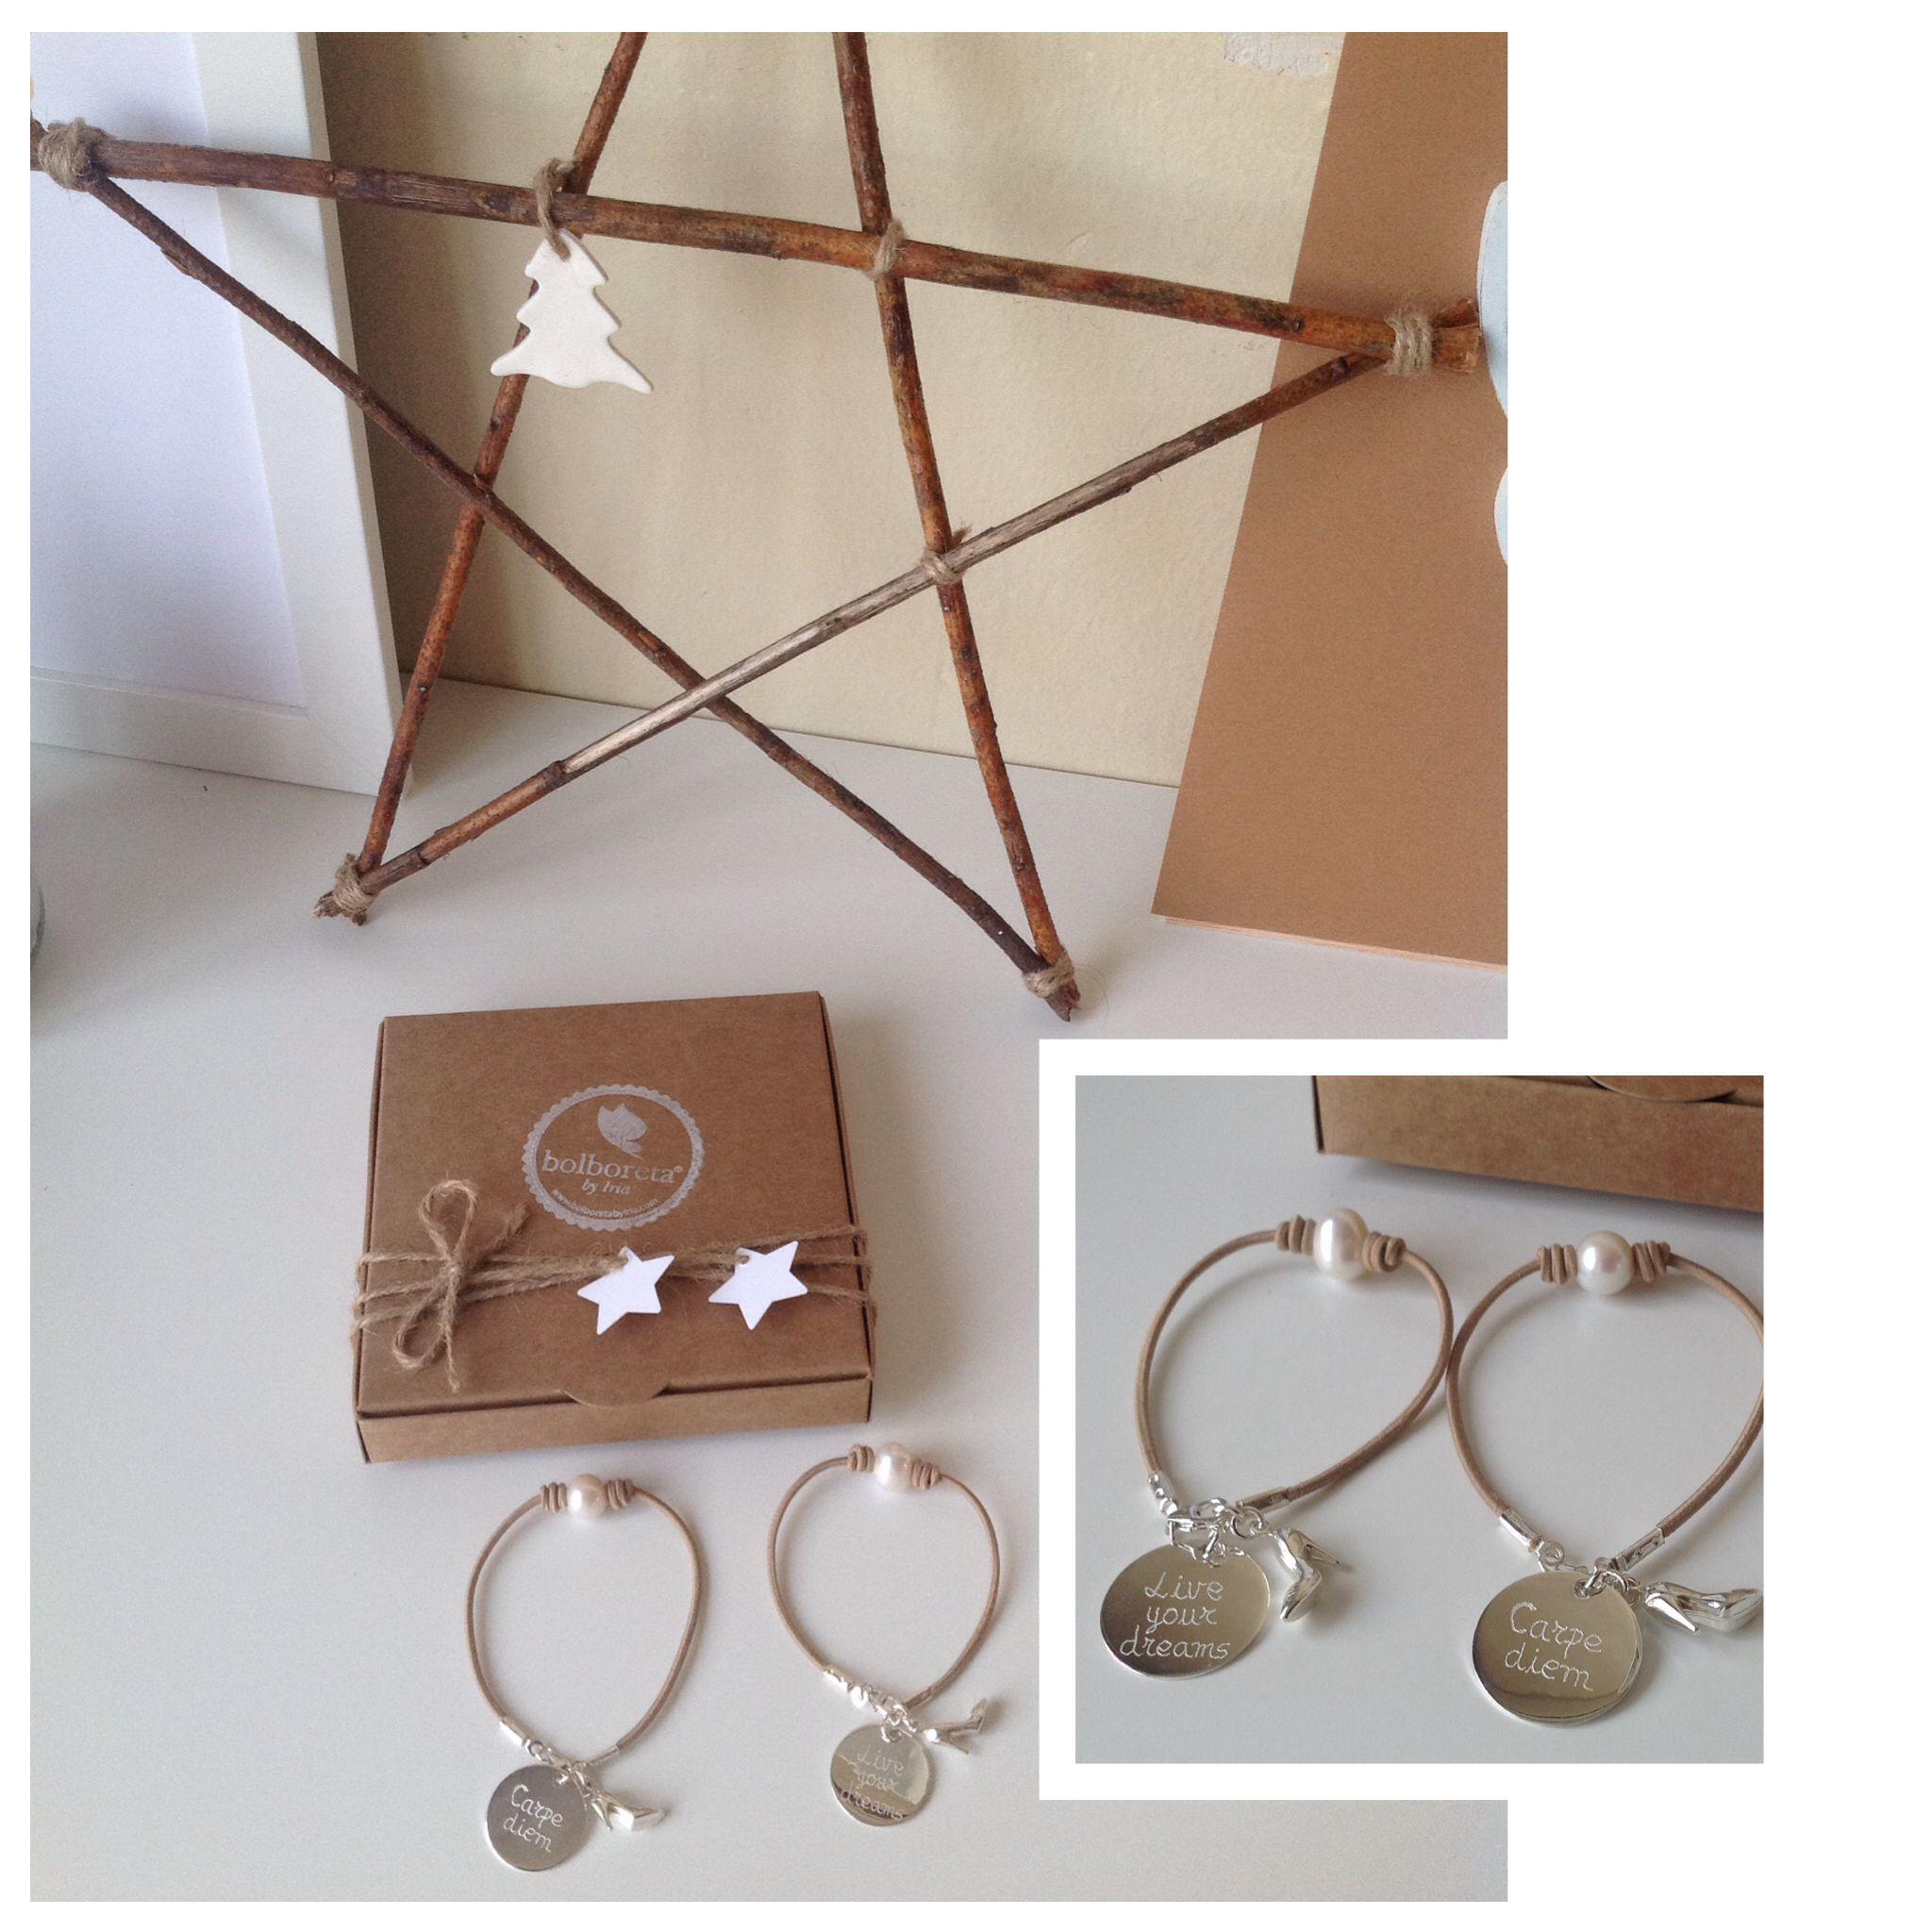 Joyitas, pulseras plata de ley personalizadas/ customized silver bracelets. Fashion jewels